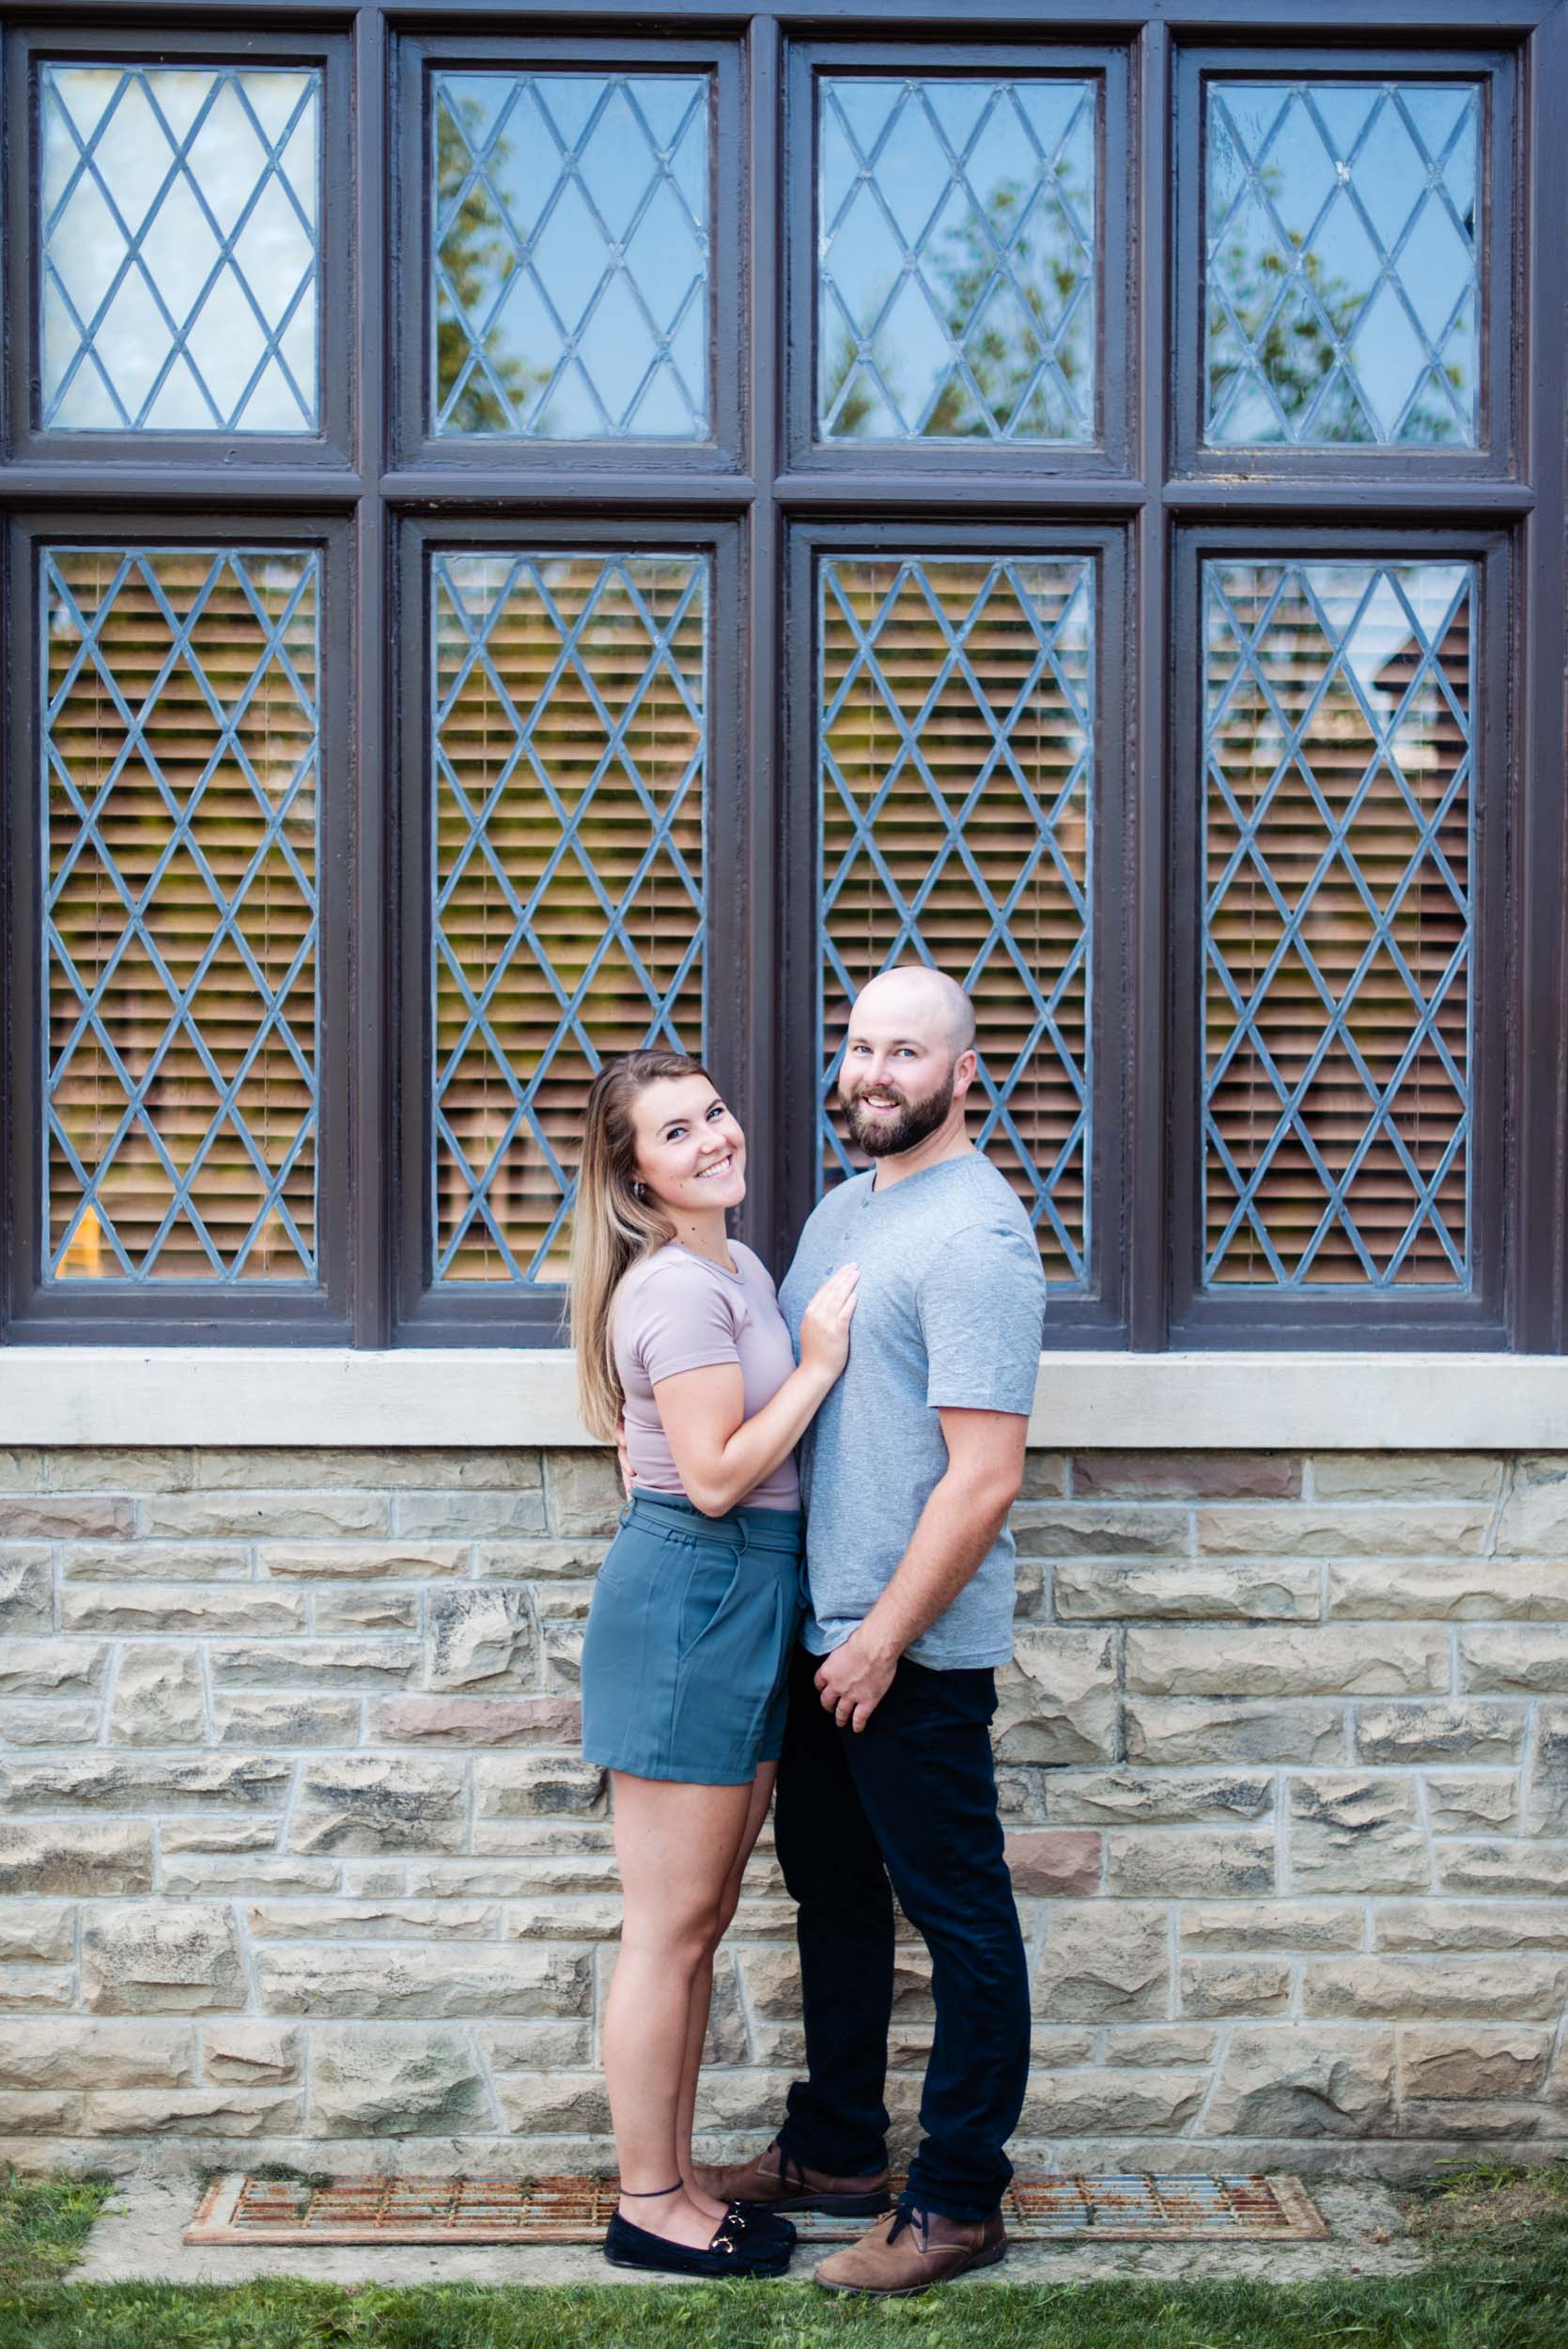 Engagement-Photography-King-College-London-Ontario (15).jpg